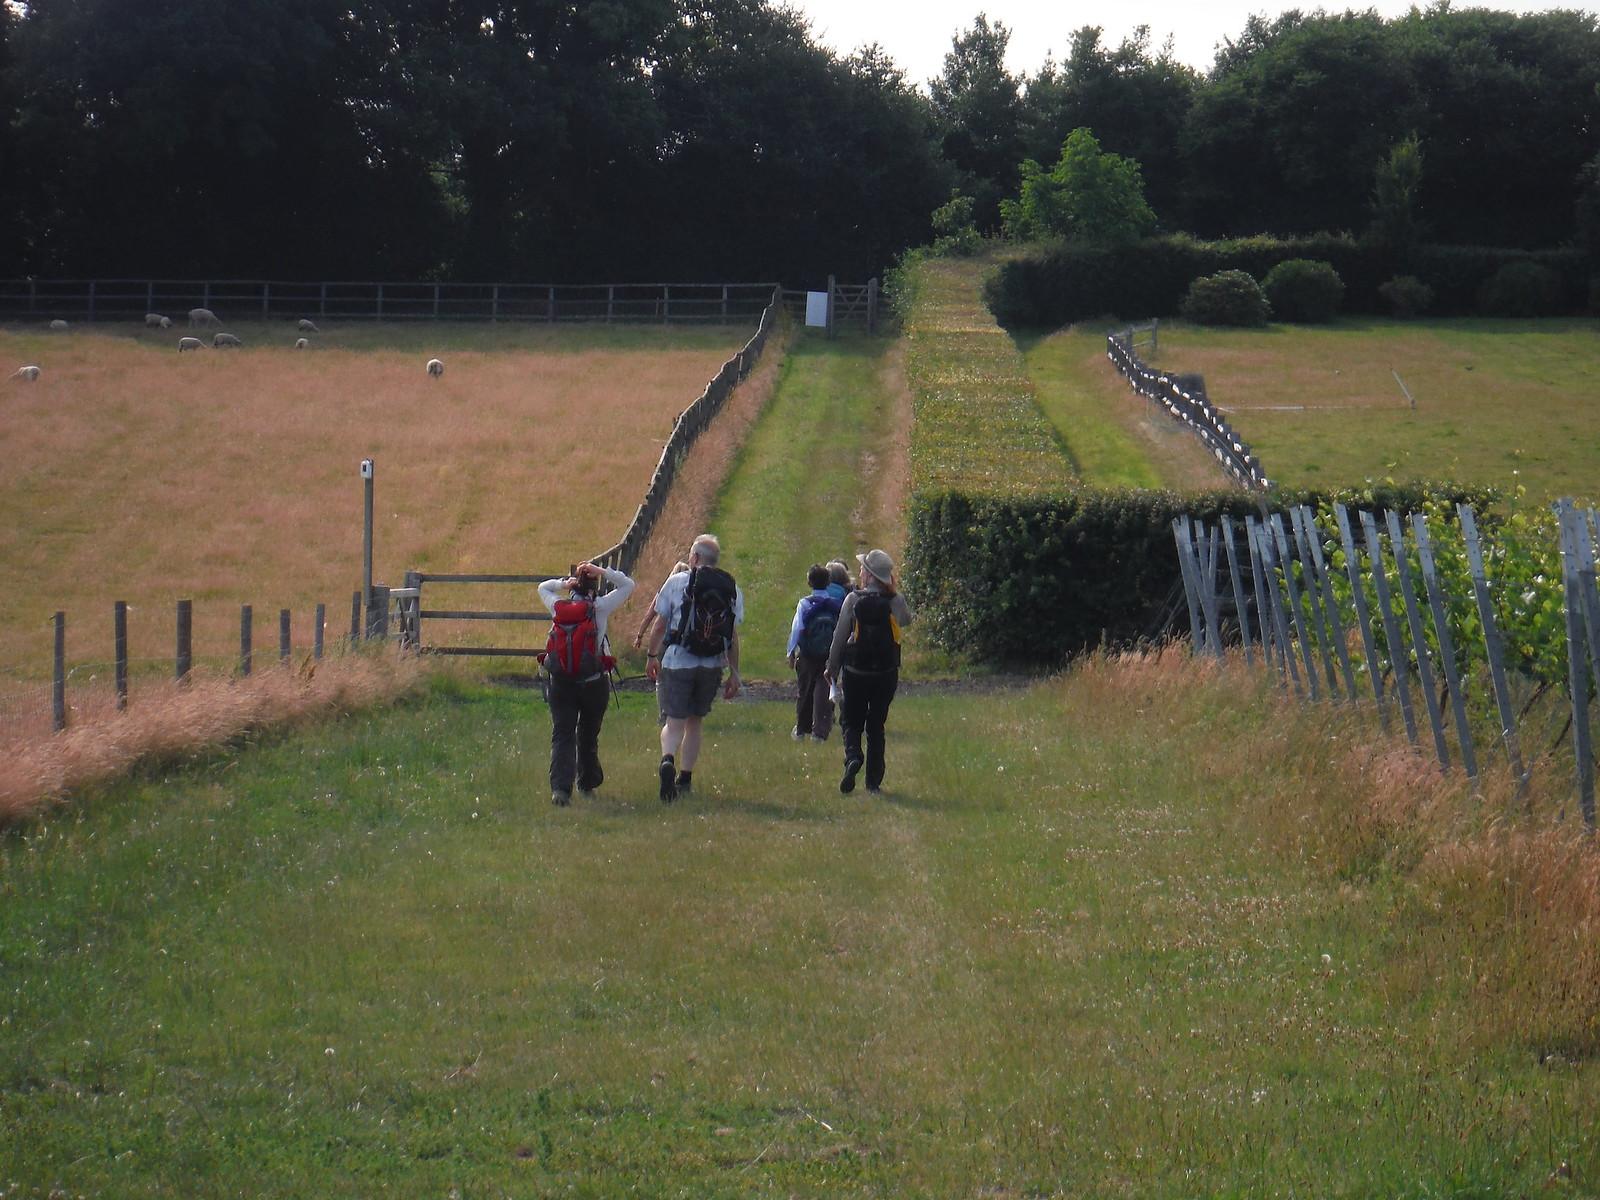 Upperton to River SWC Walk 217 Midhurst Way: Arundel to Midhurst